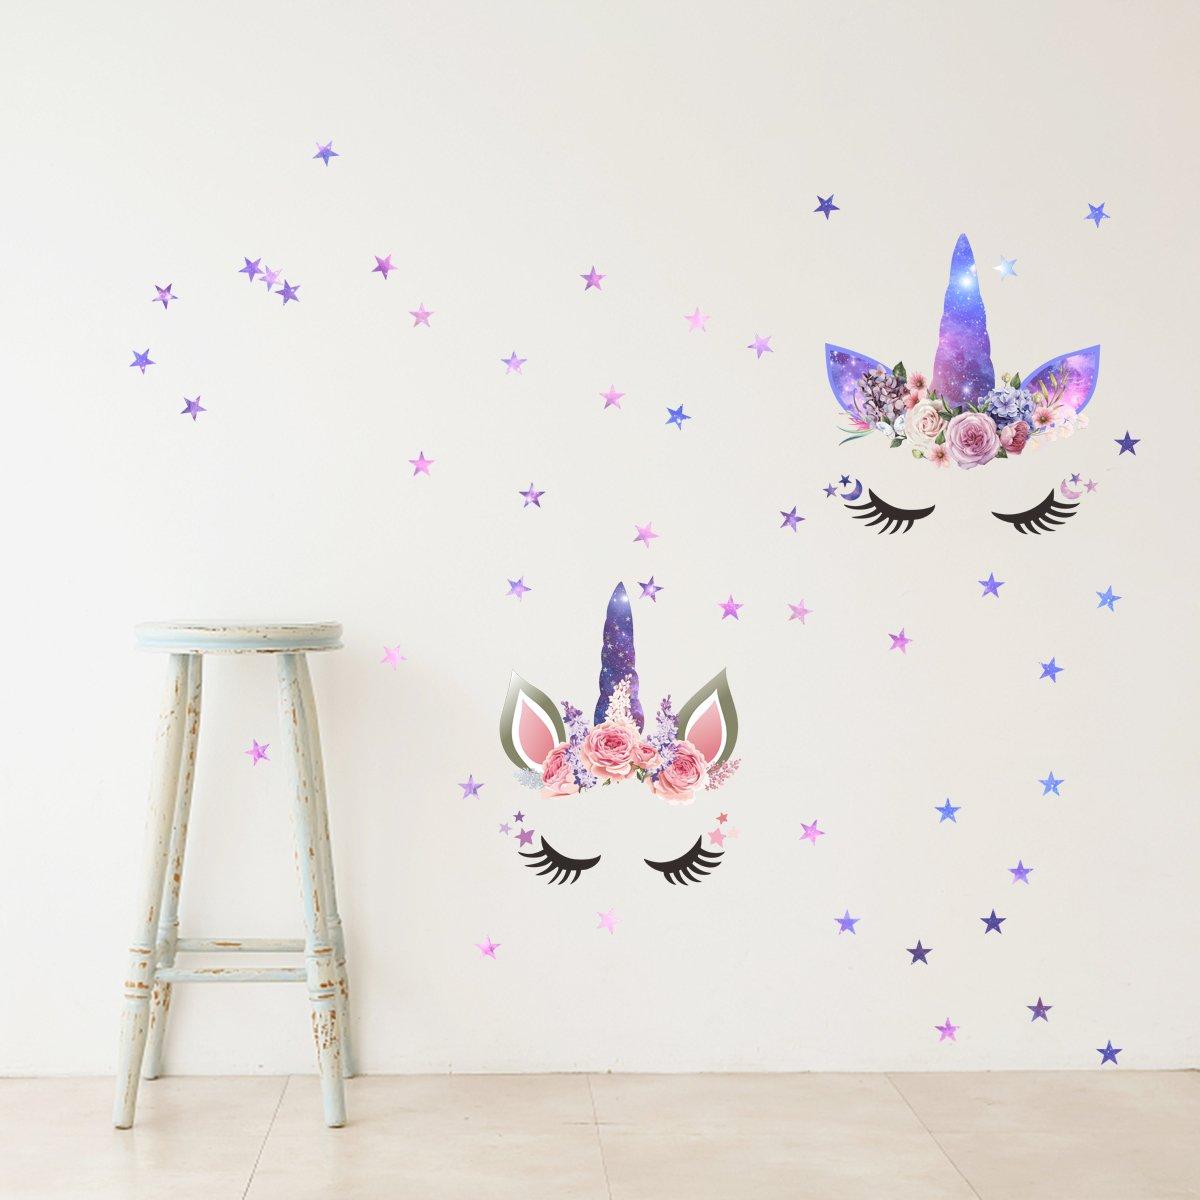 Mozamy Creative Unicorn Wall Decals Girls Wall Decals Girls Room Wall  Decals Girls Bedroom Wall Decor Unicorn Theme Party Decorations Floral  Galaxy ...